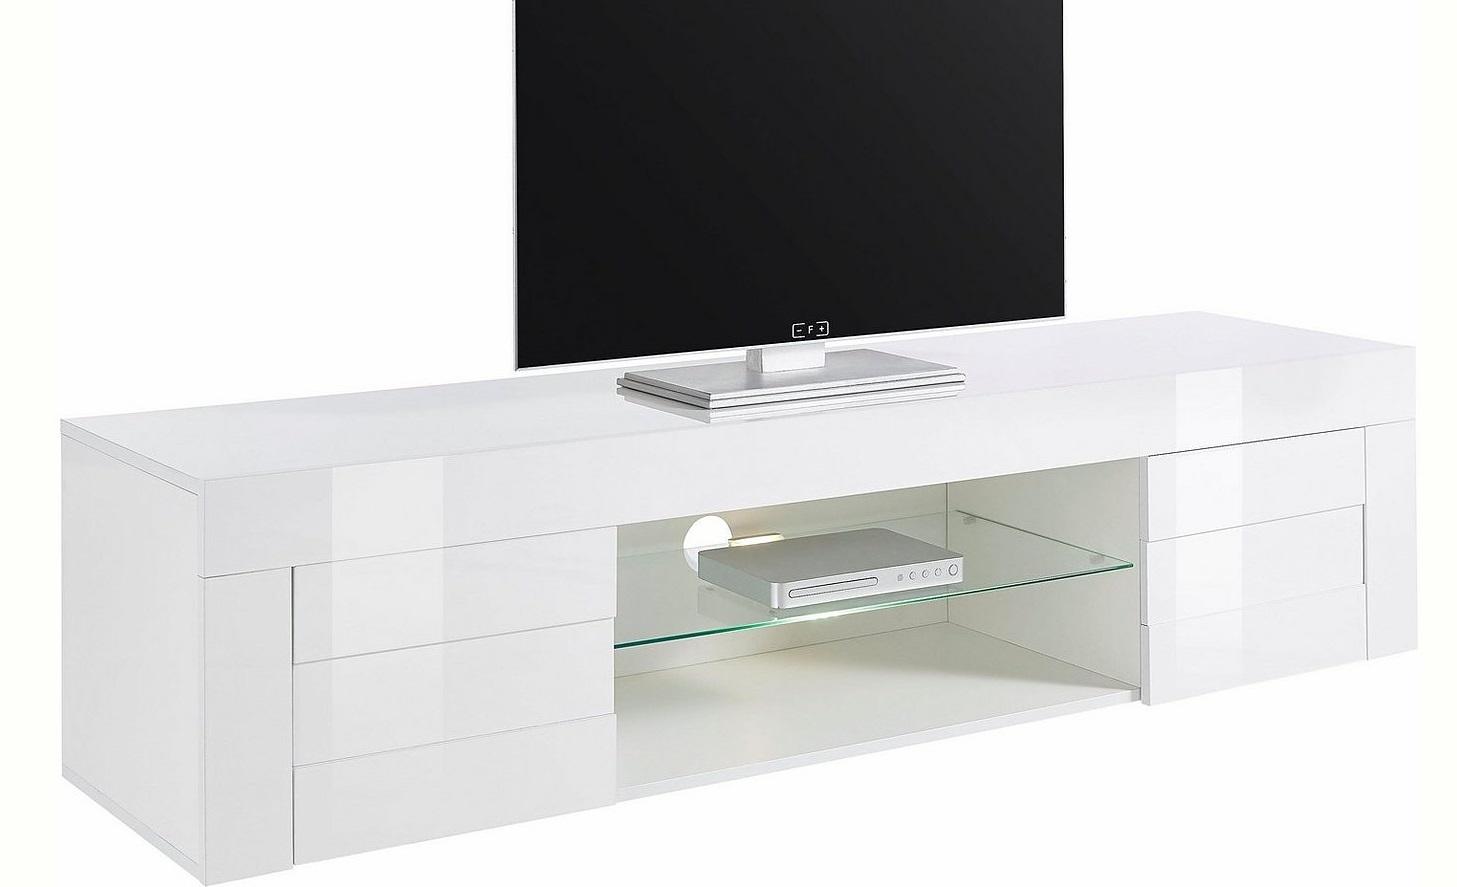 Tv-meubel Easy 181 cm breed – hoogglans wit | Pesaro Mobilia